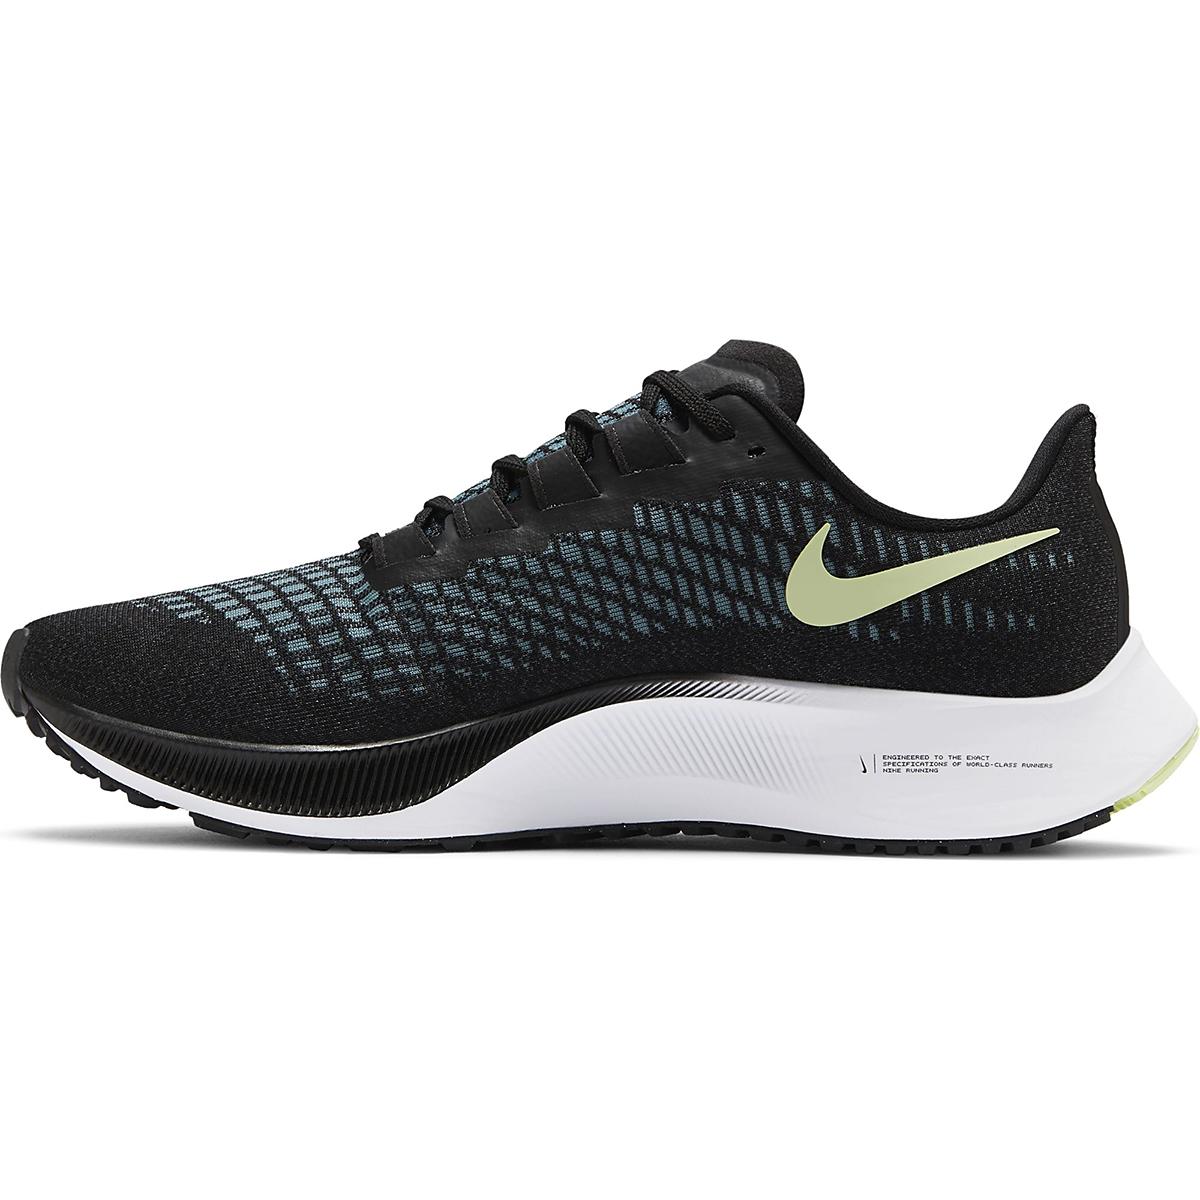 Women's Nike Air Zoom Pegasus 37 Running Shoe - Color: Black/Glacier Ice-Barely Volt-White - Size: 6 - Width: Regular, Black/Glacier Ice-Barely Volt-White, large, image 2